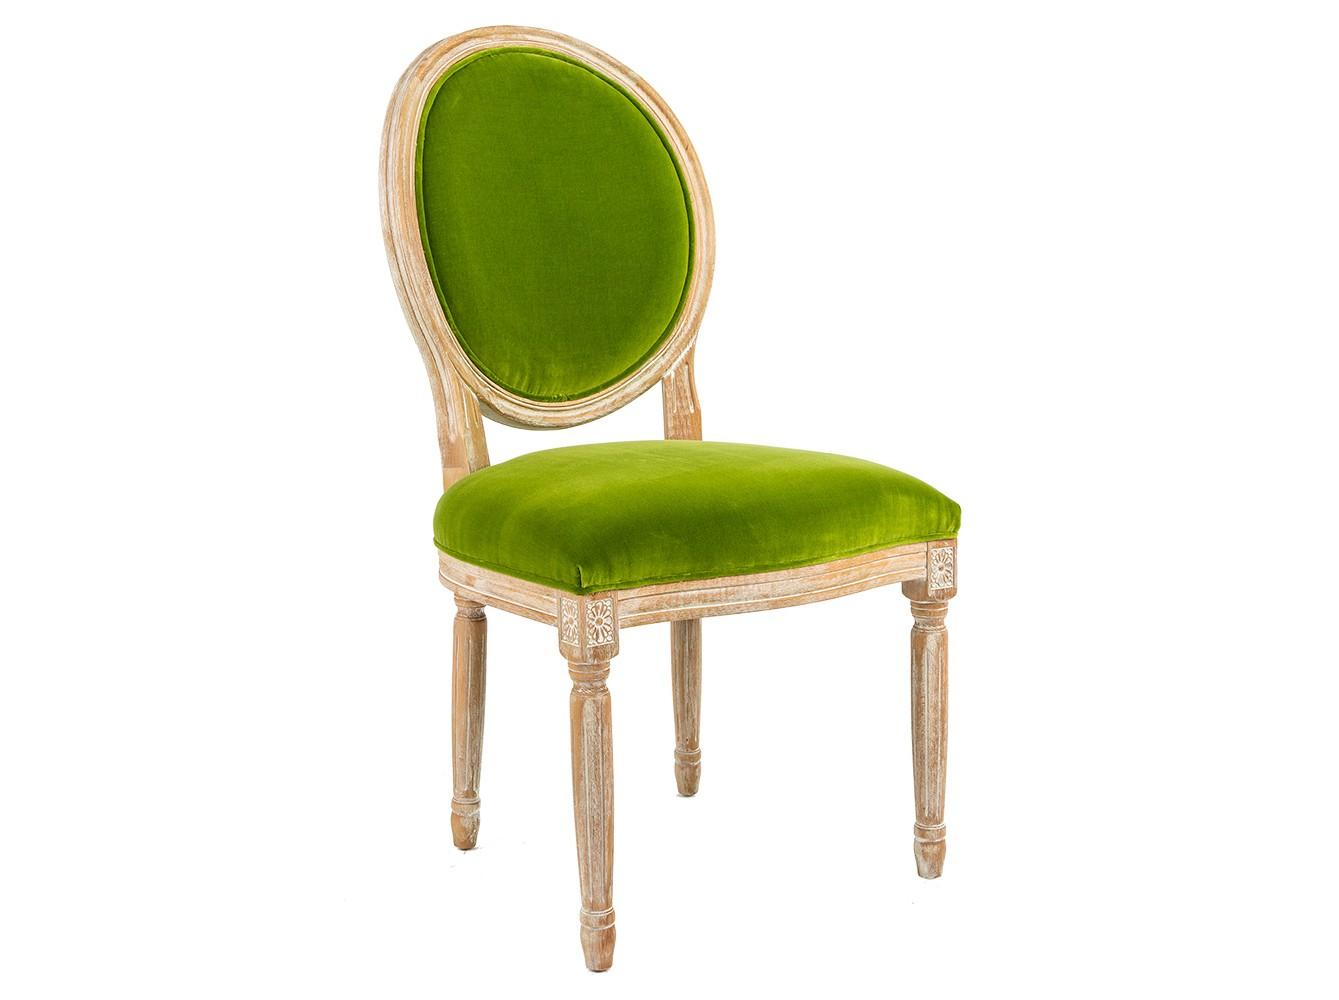 Кухонный стул Object Desire 15438270 от thefurnish